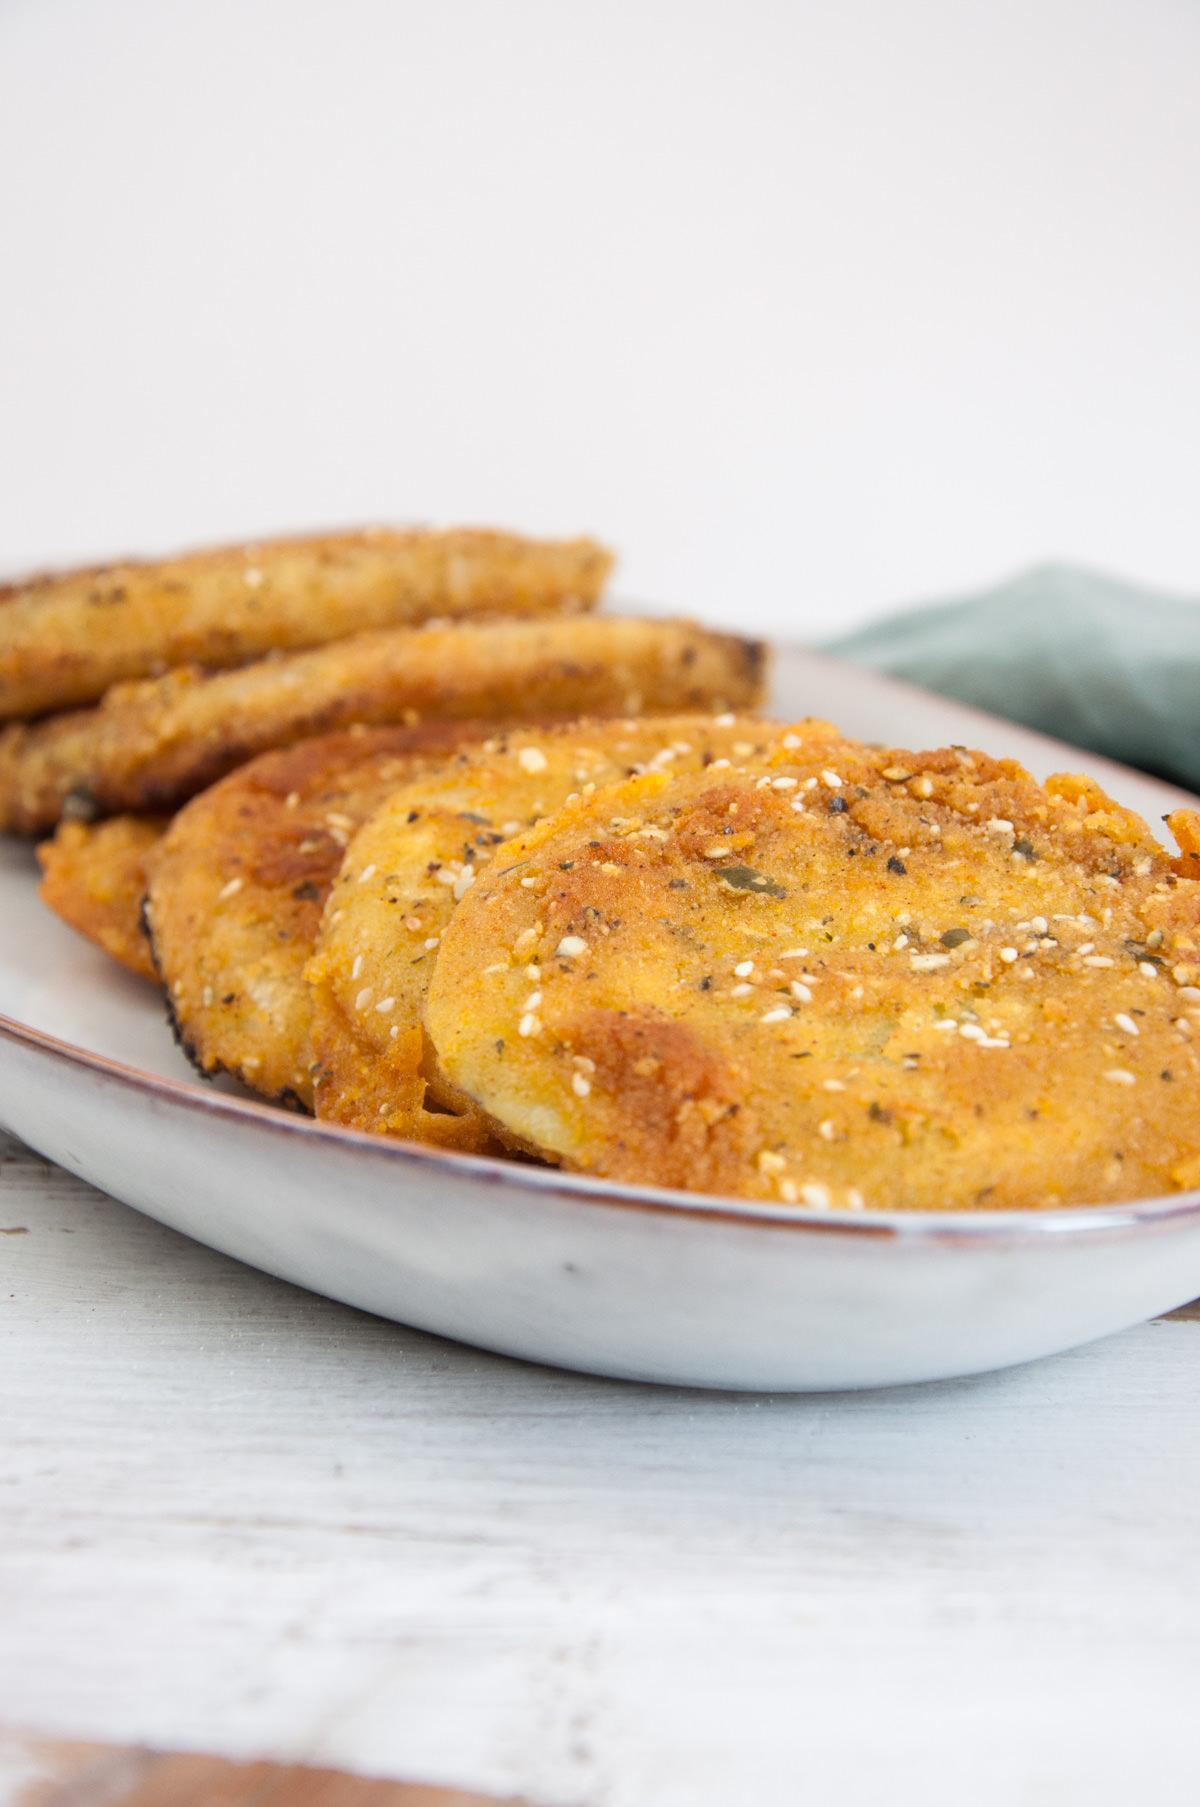 Kohlrabi Schnitzel